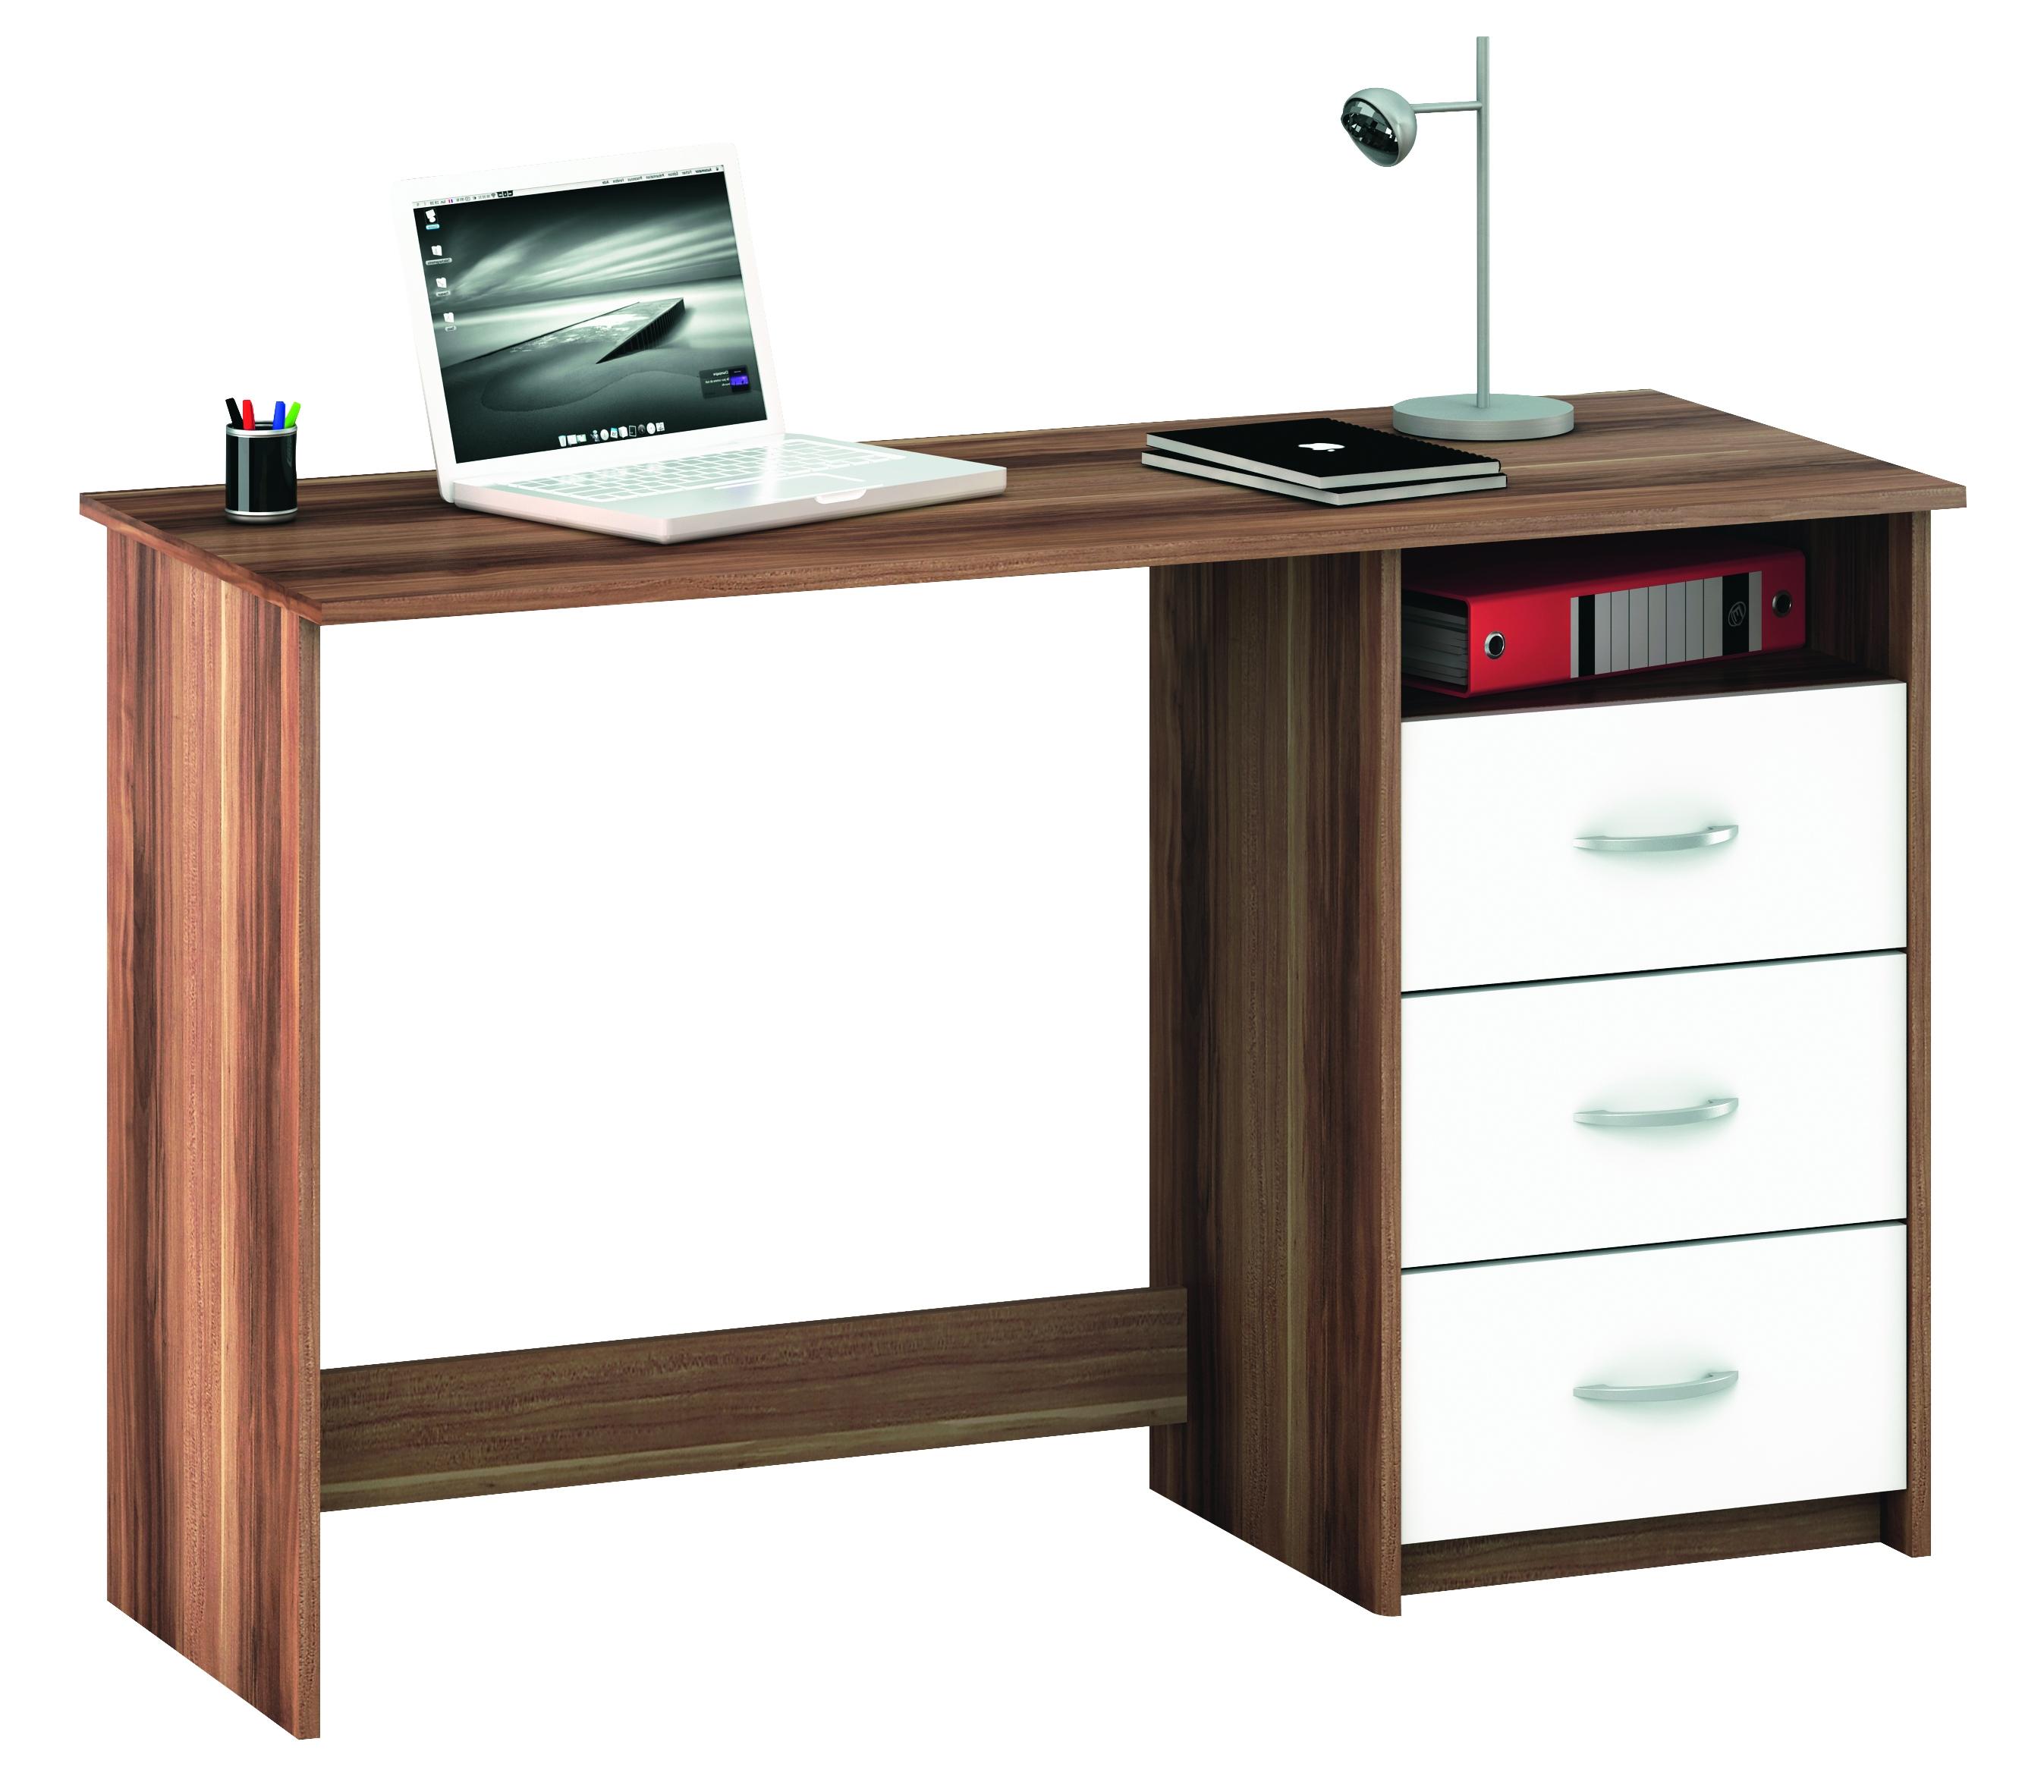 Bureau 1 caisson 3 tiroirs merano aristote - Caisson bureau 3 tiroirs ...